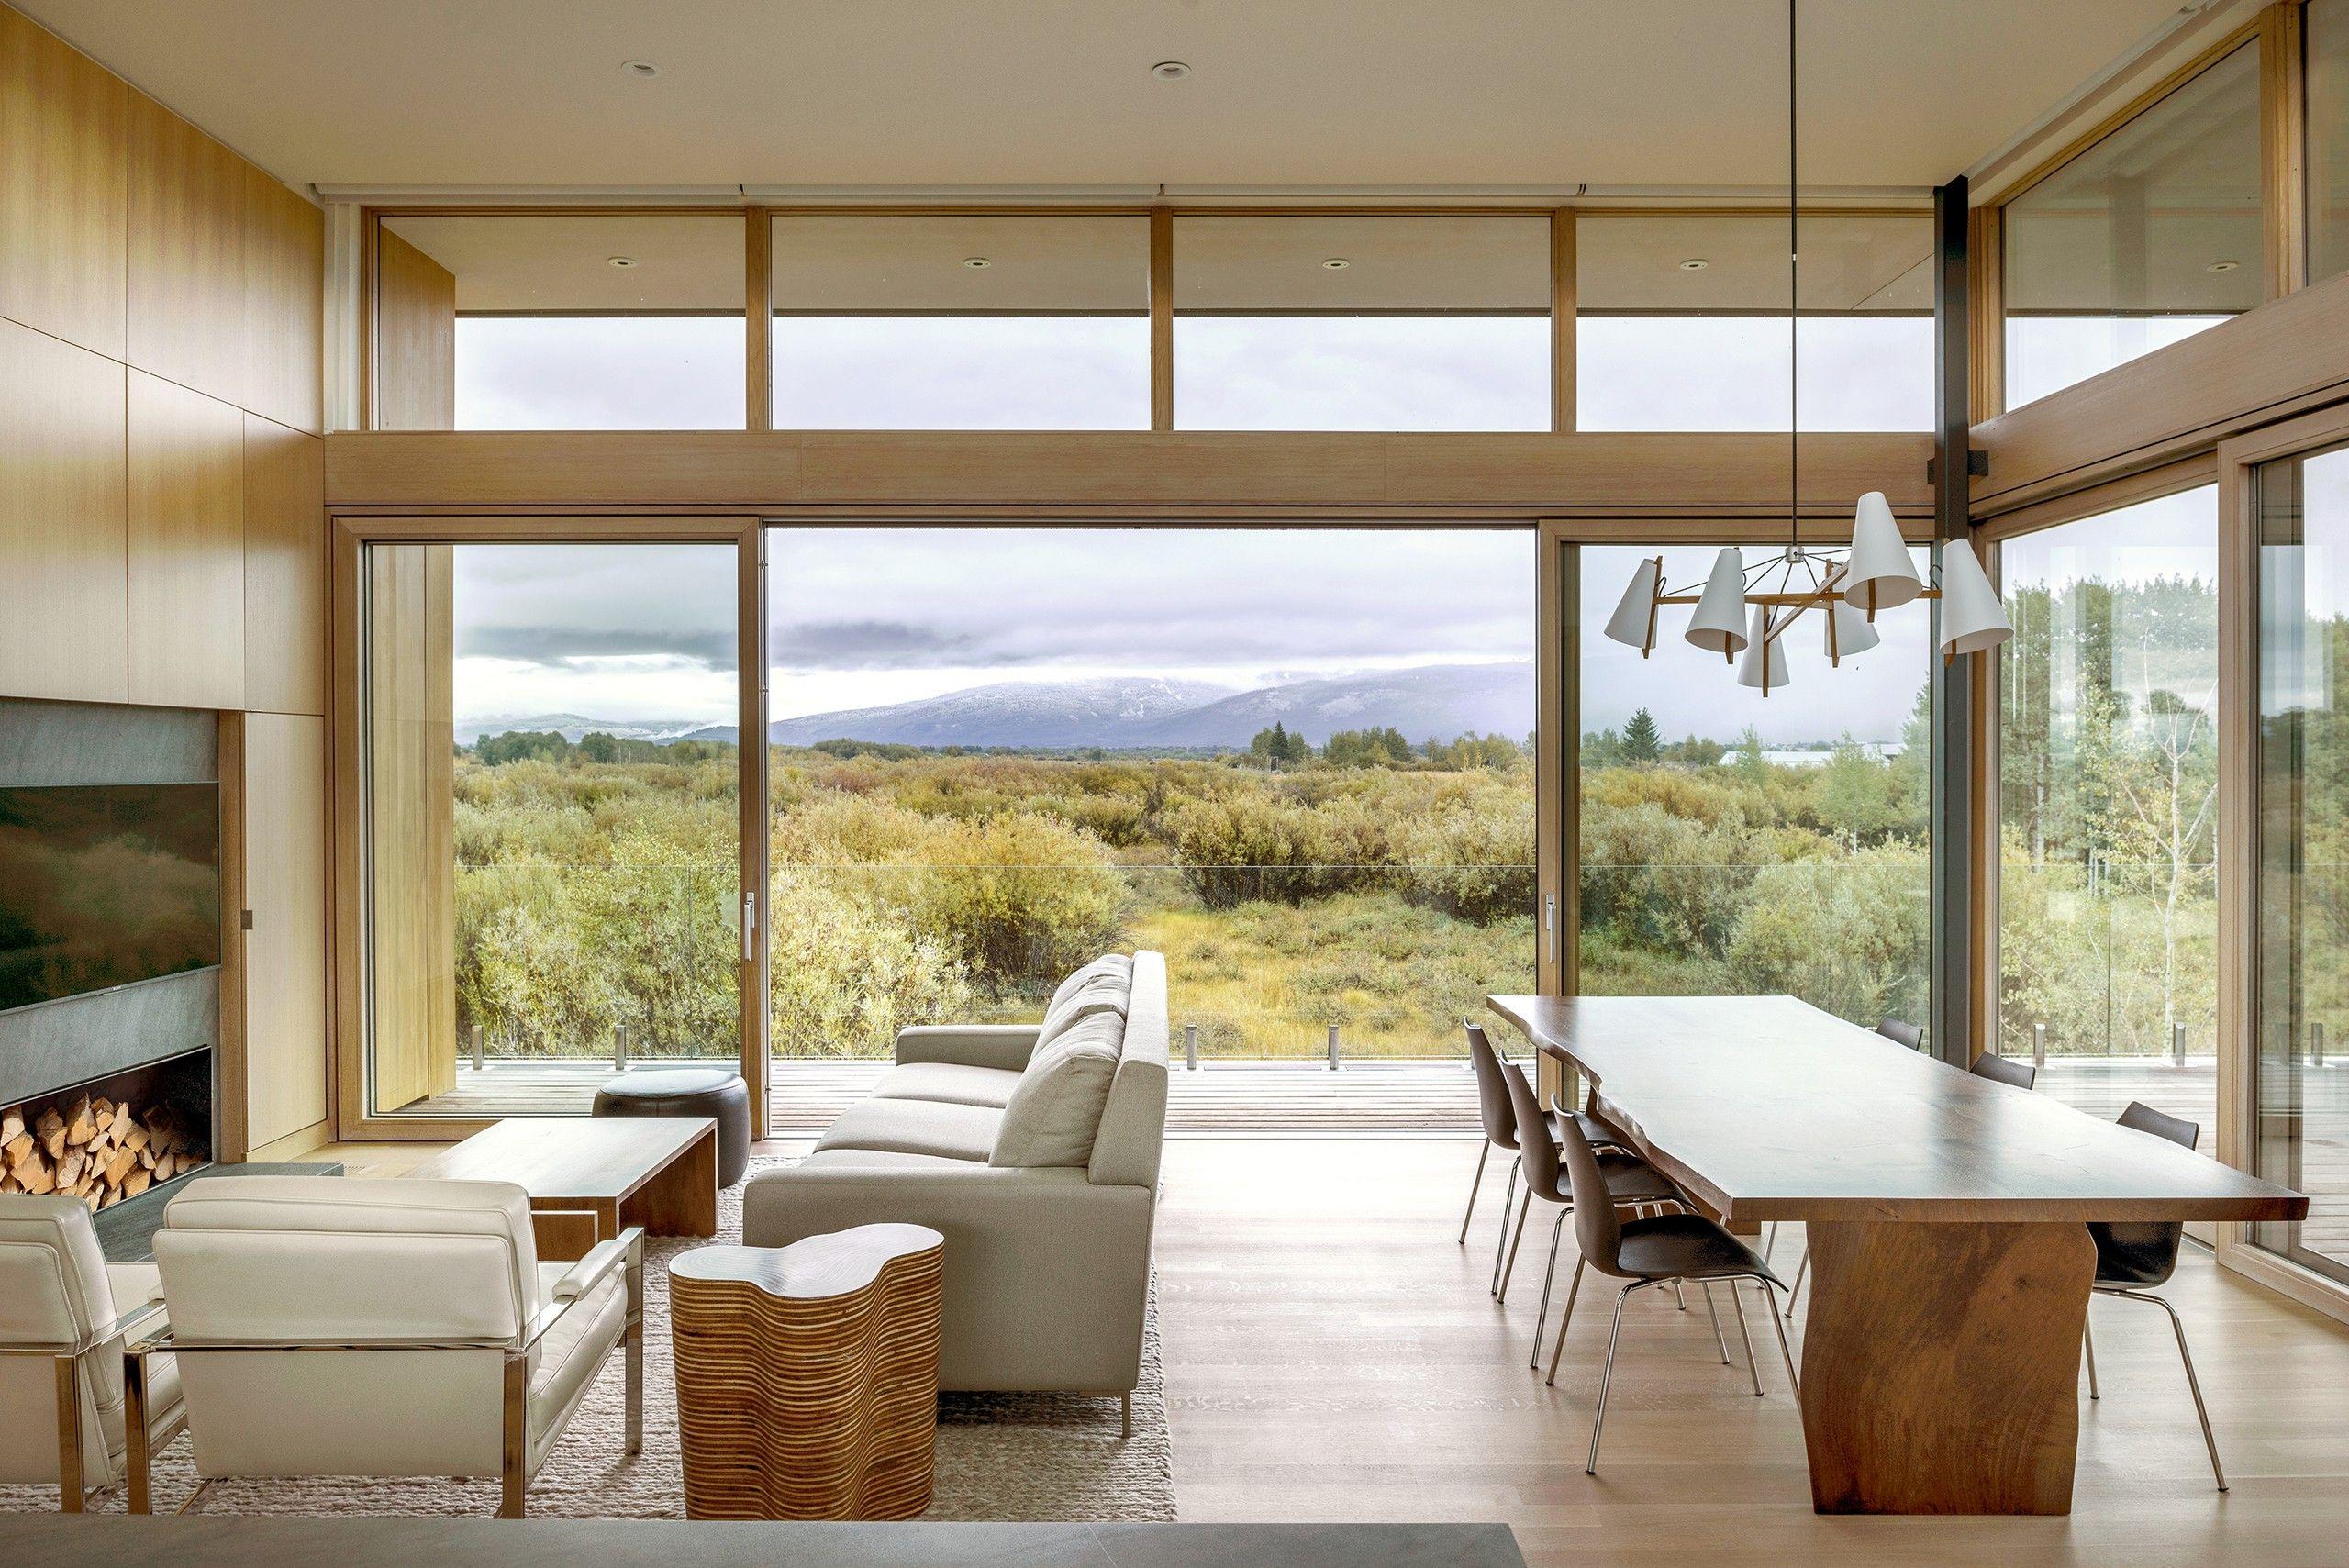 Teton residence ro rockett design media photos and videos archello also rh pinterest